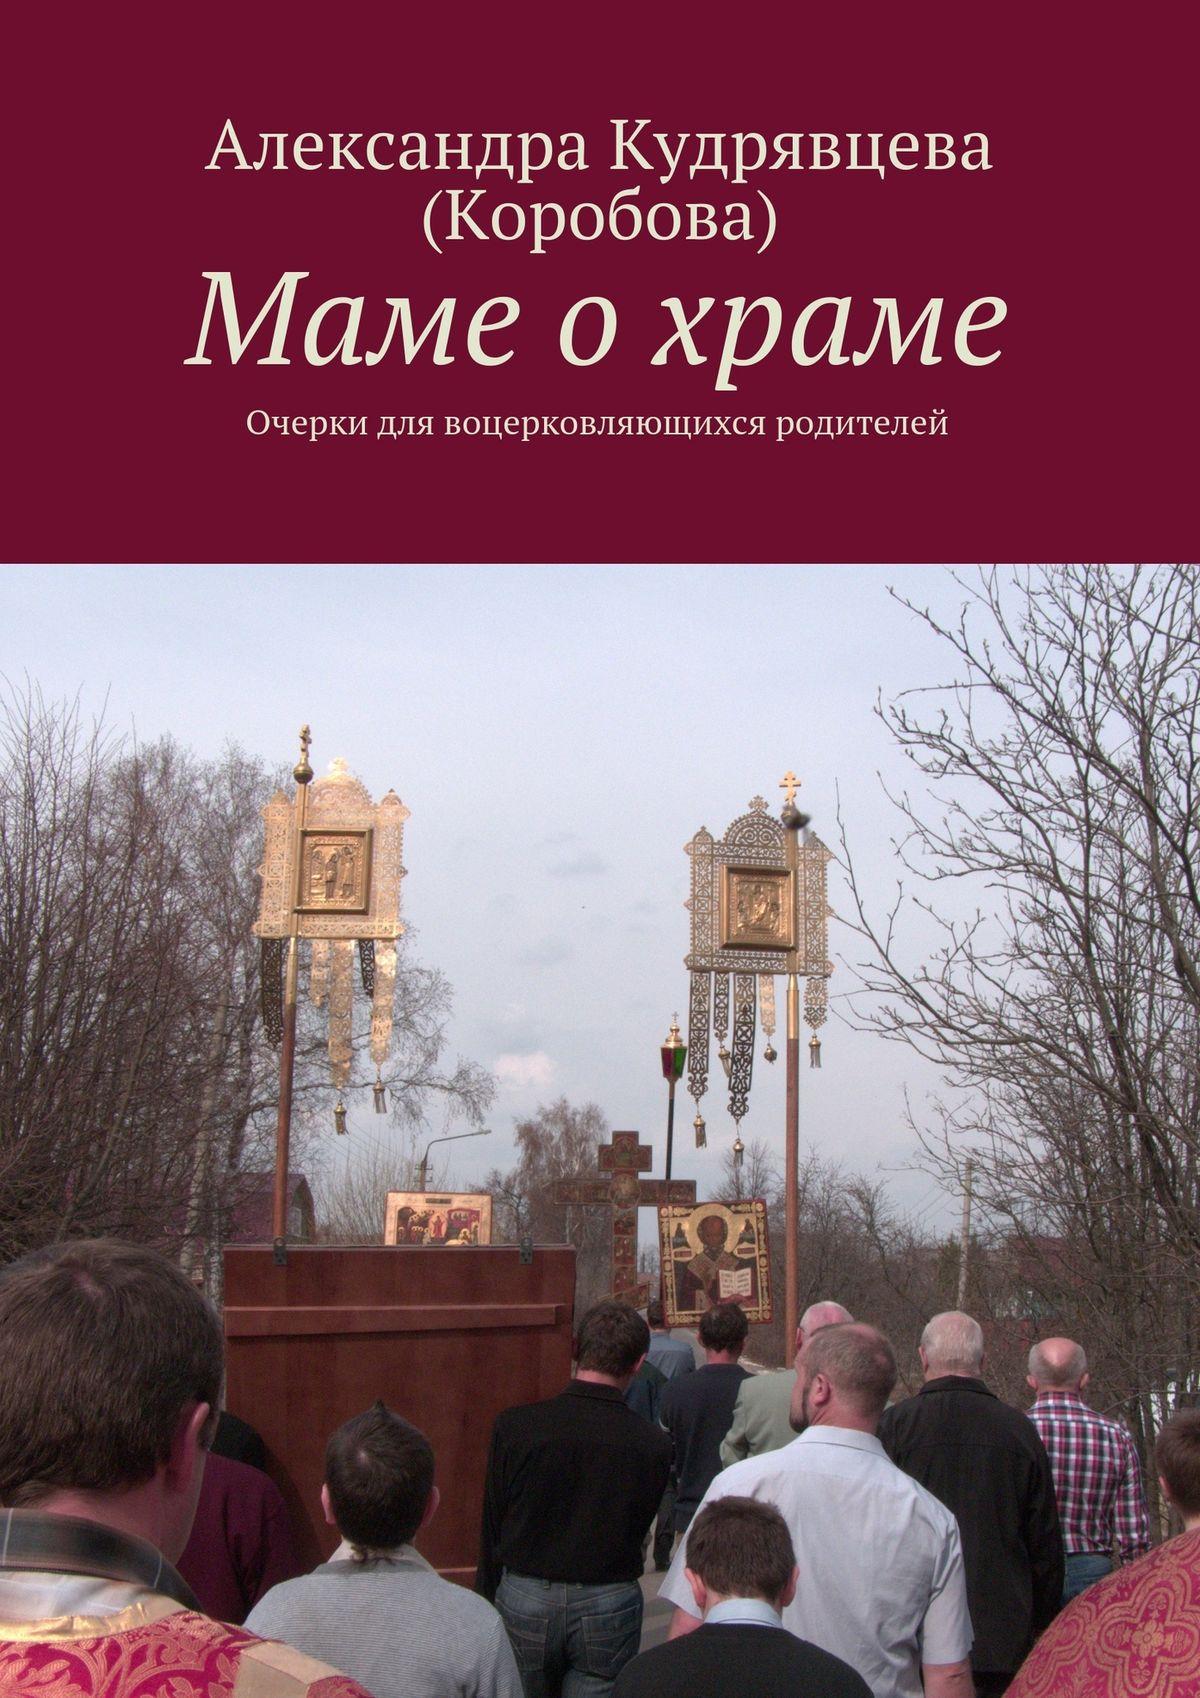 Александра Кудрявцева (Коробова) Маме охраме сивакова о сост празднуем пасху в храме и дома